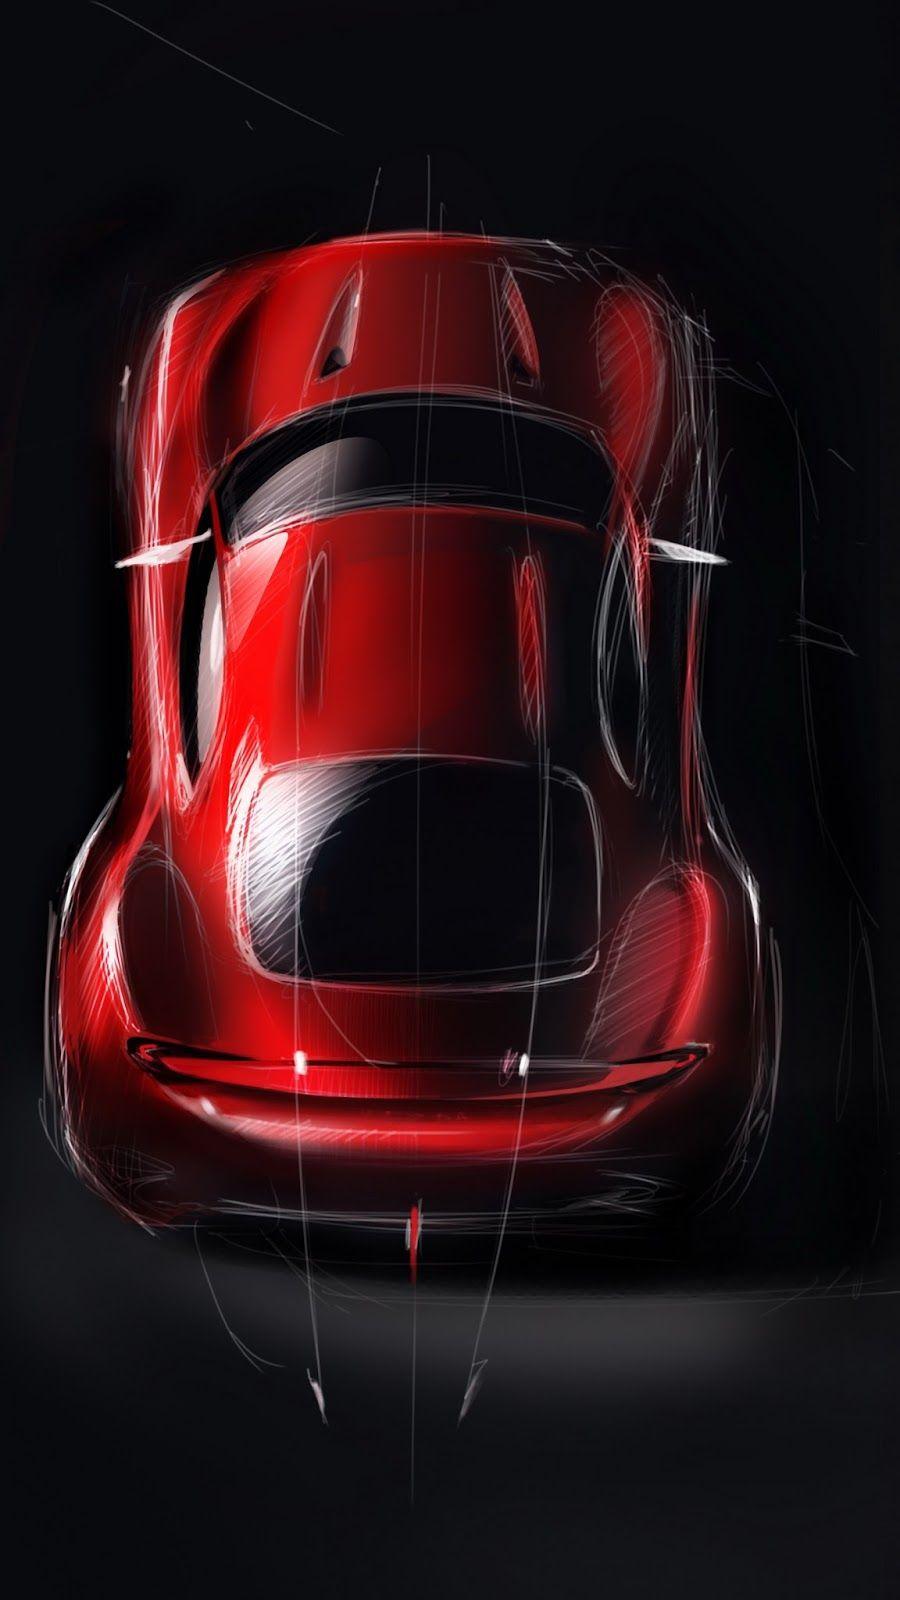 Mazda Rx 9 To Go On Sale In 2020 Latest Report Says Car Design Sketch Futuristic Cars Automotive Design